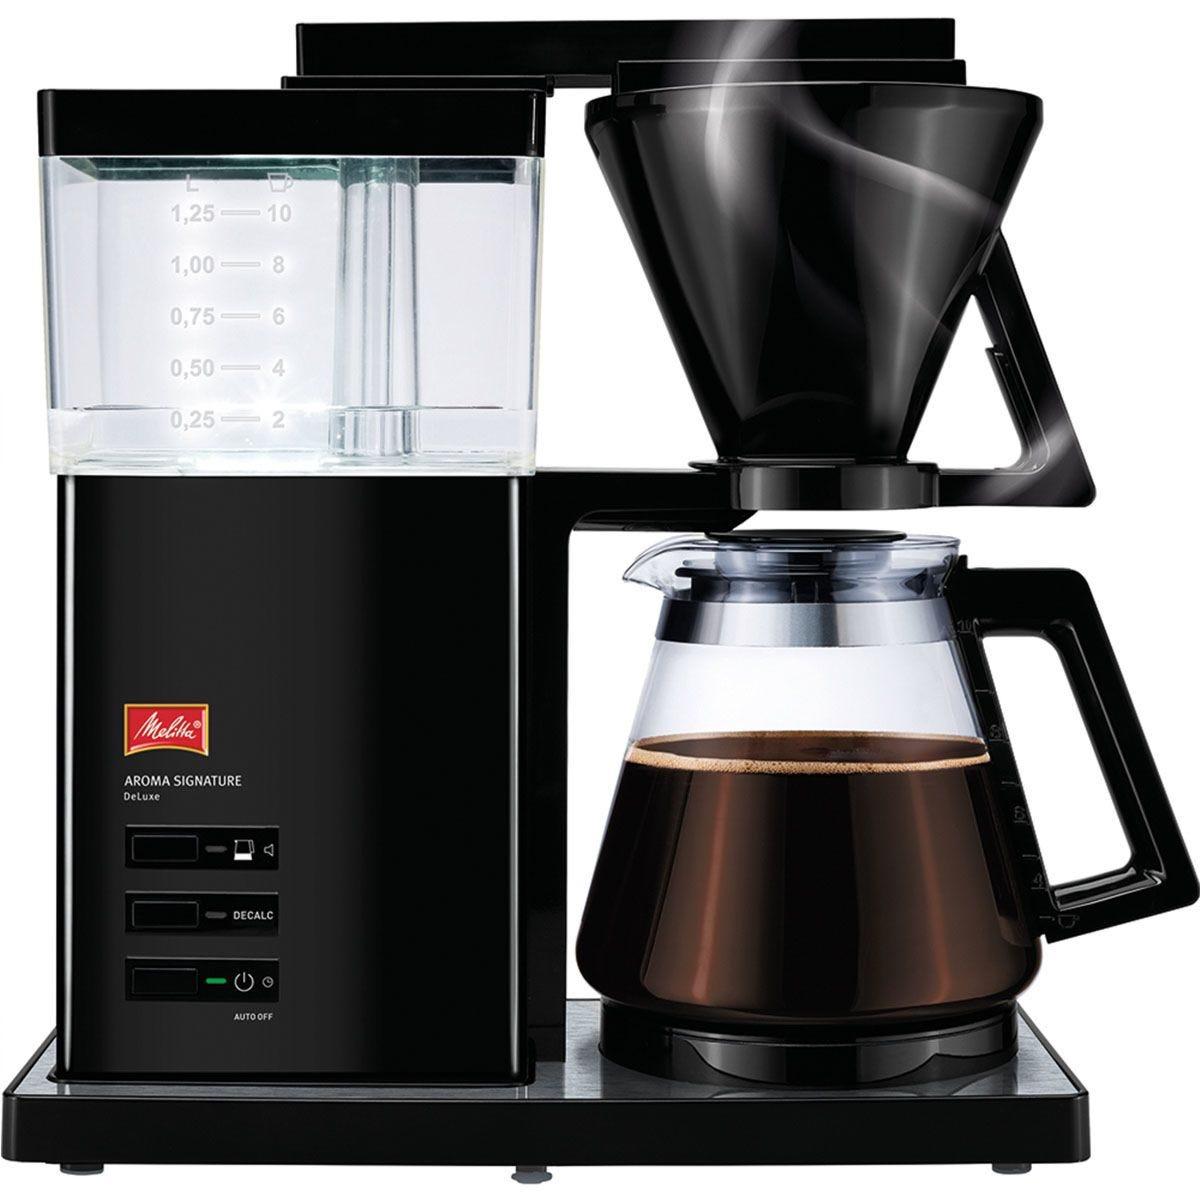 Melitta 6764396 Aroma Signature Deluxe 1800W Filter Coffee Machine– Black